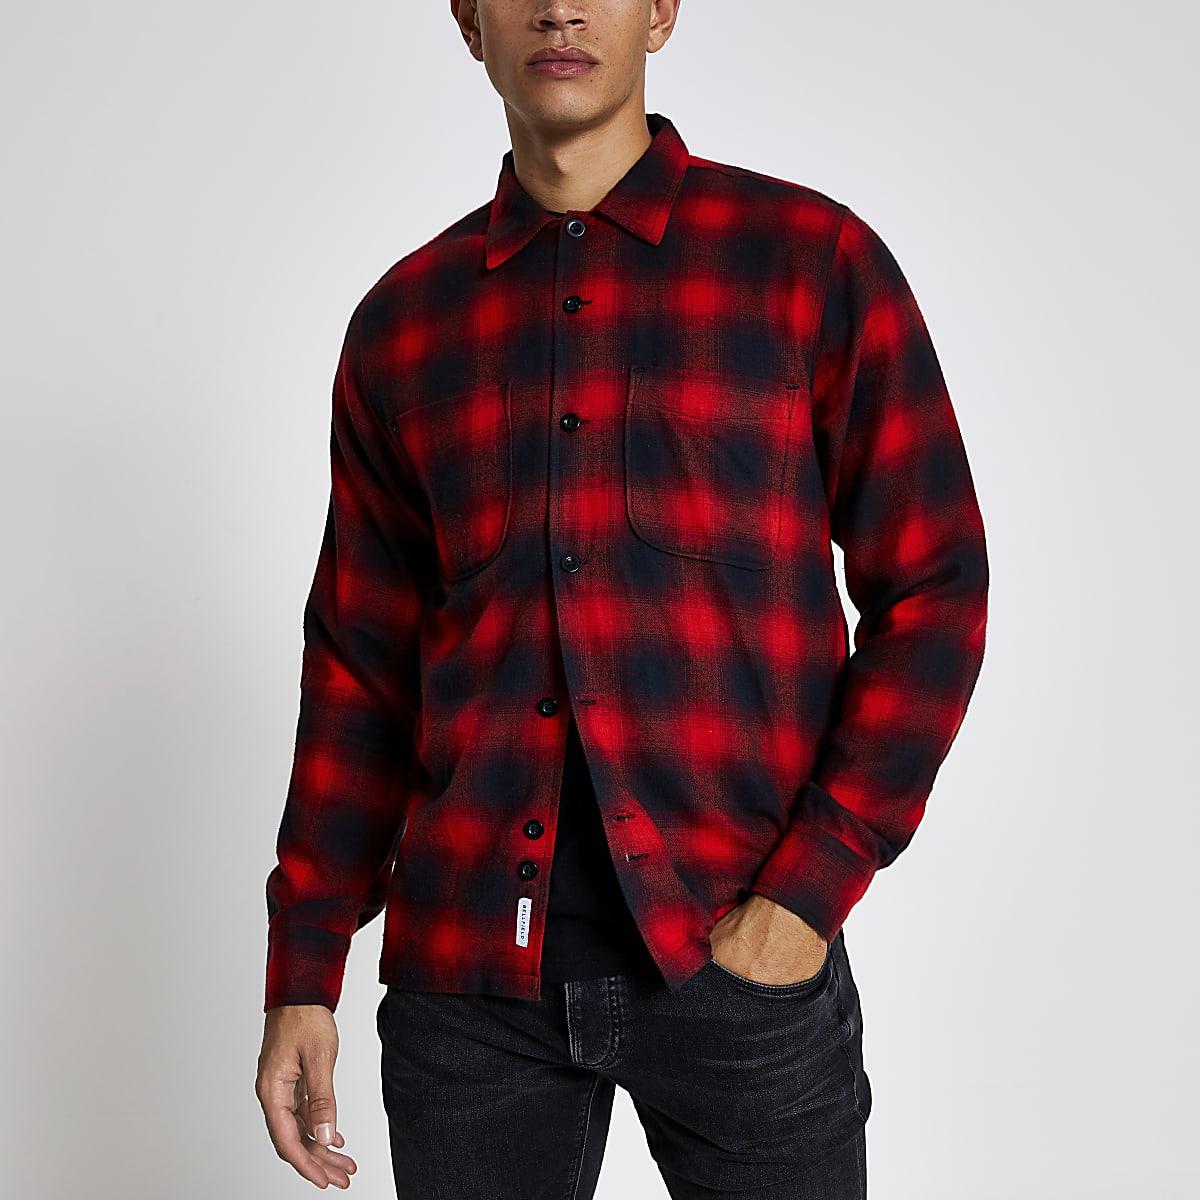 Bellfield red check long sleeve shirt